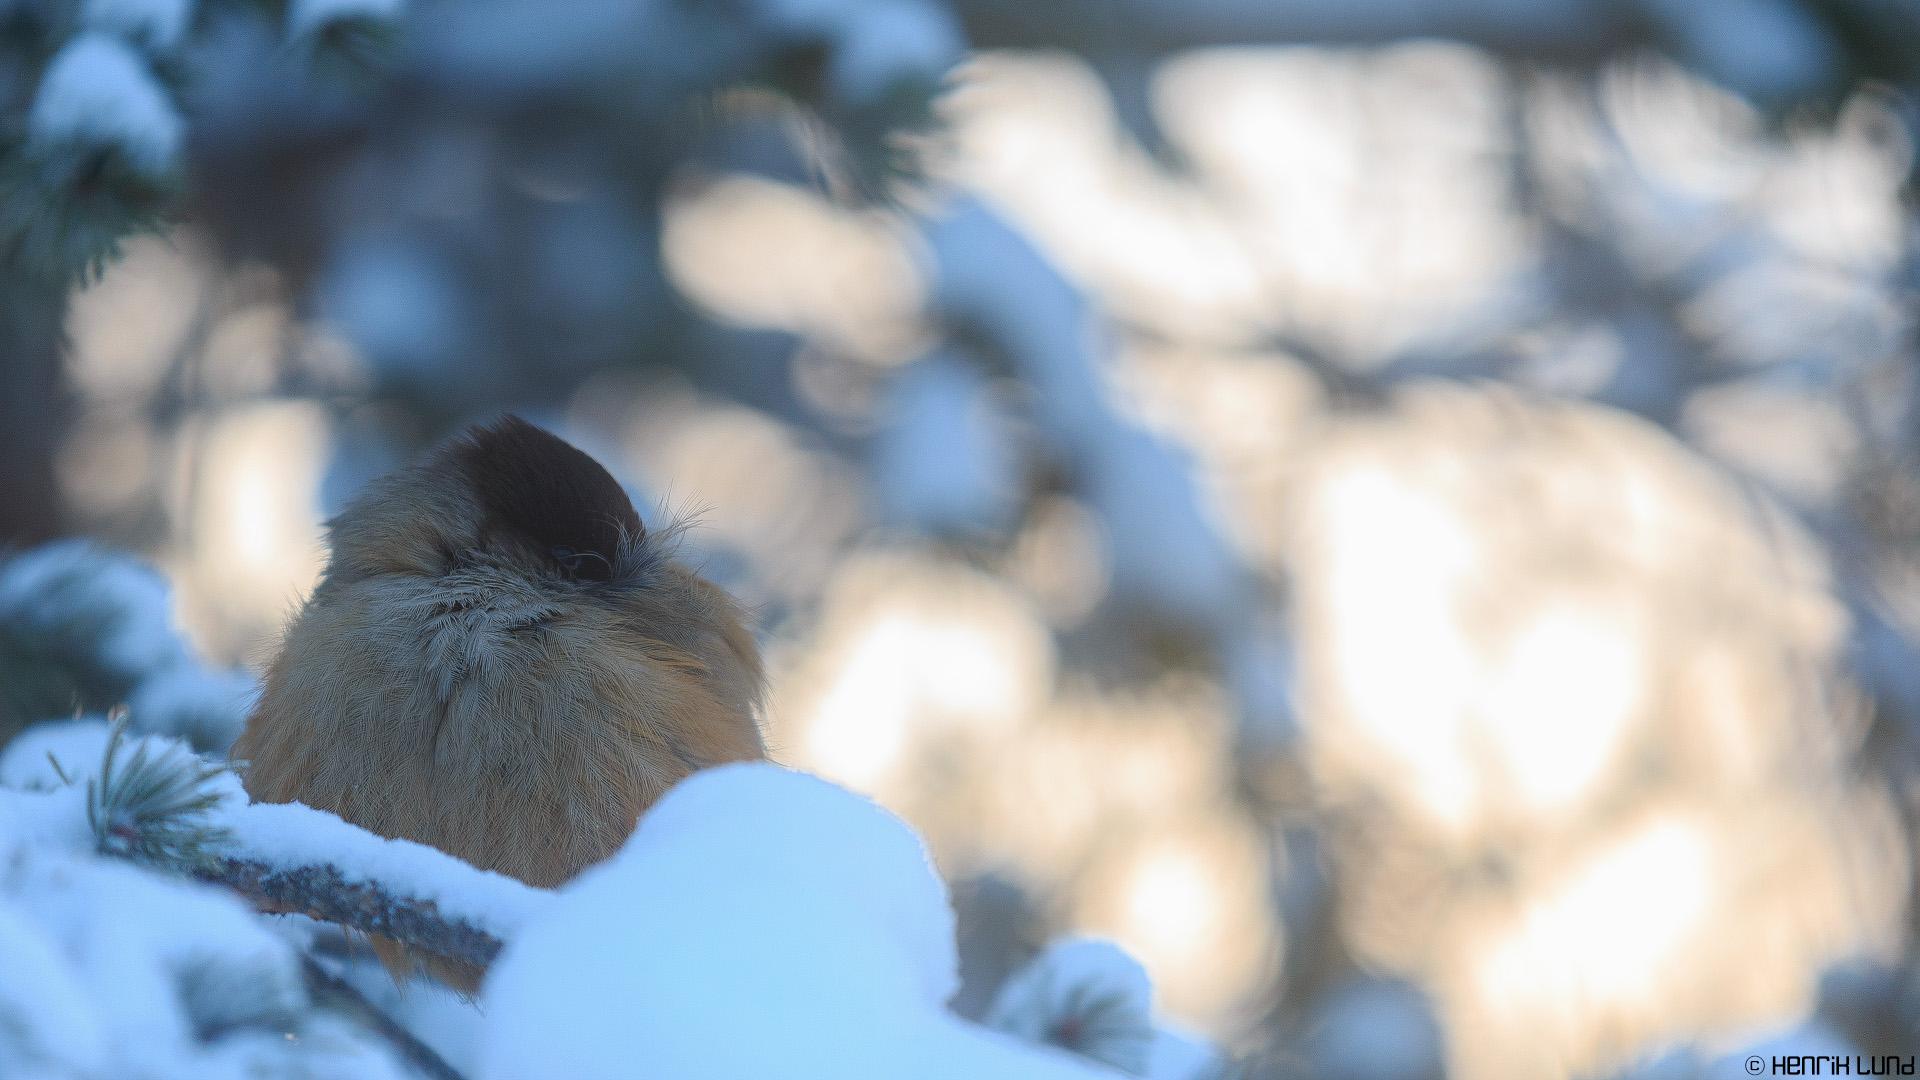 Siberian jay - Perisoreus infaustus - in beautiful morning light. Ruka, Kuusamo, Finland, February 2014.